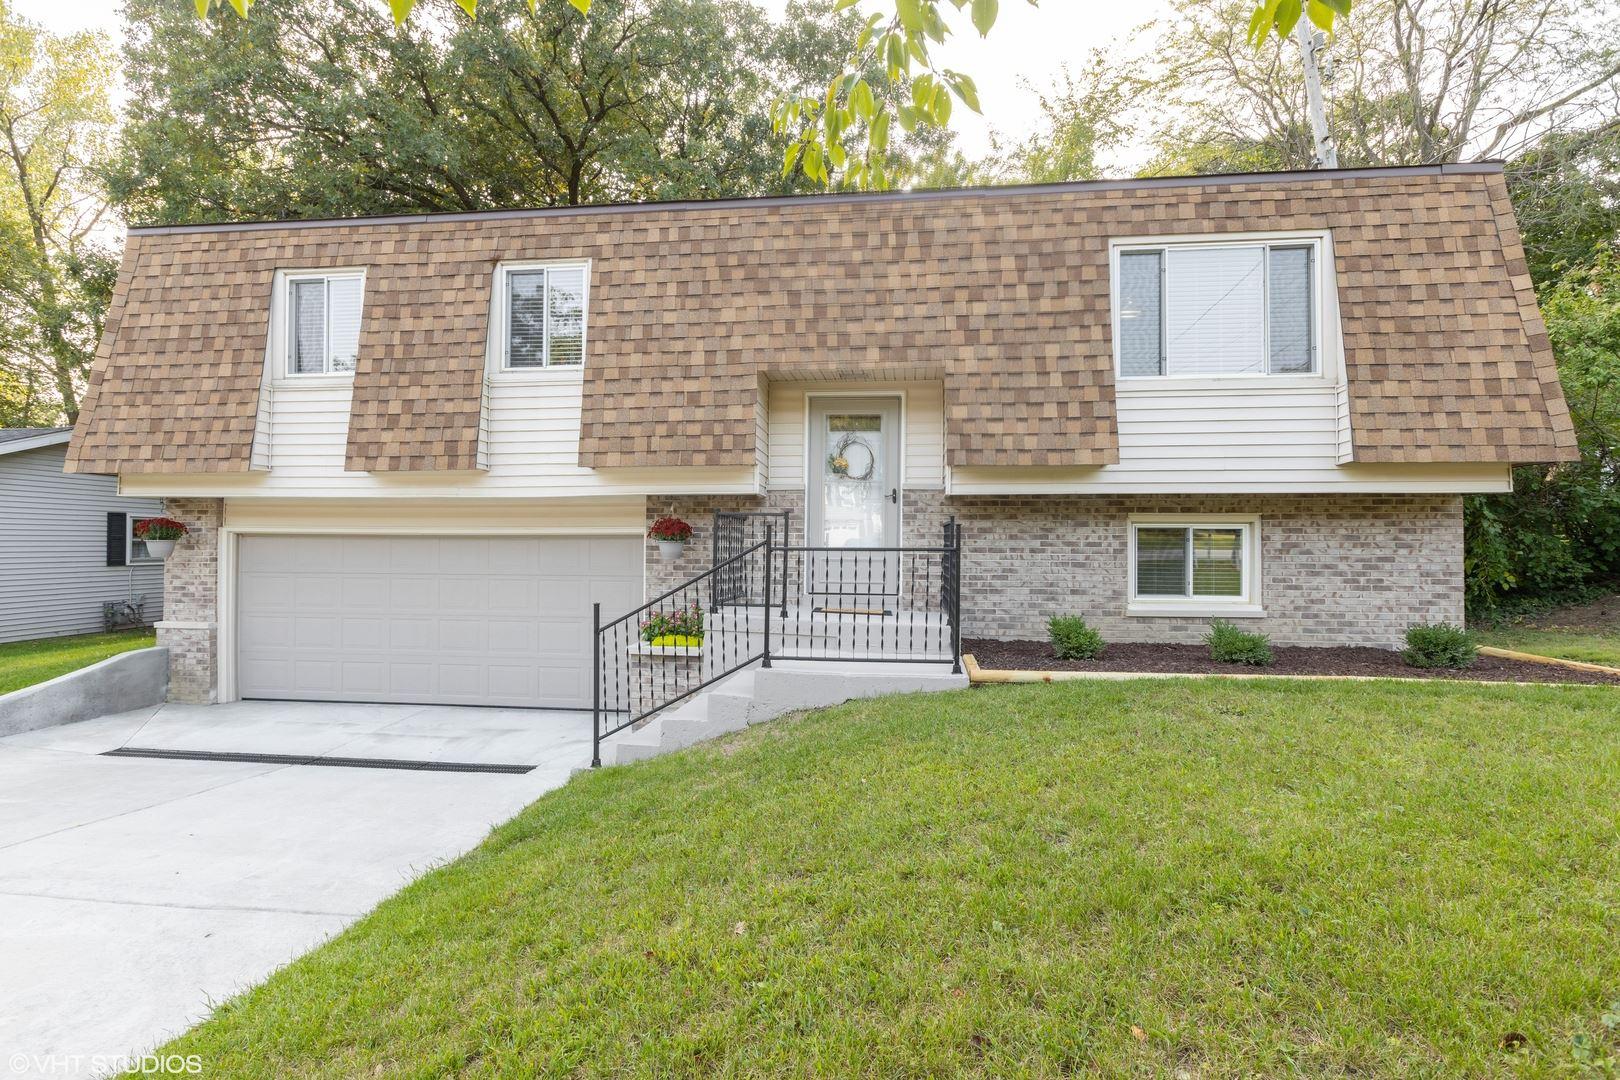 Photo of 407 N Brookshore Drive, Shorewood, IL 60404 (MLS # 10852777)